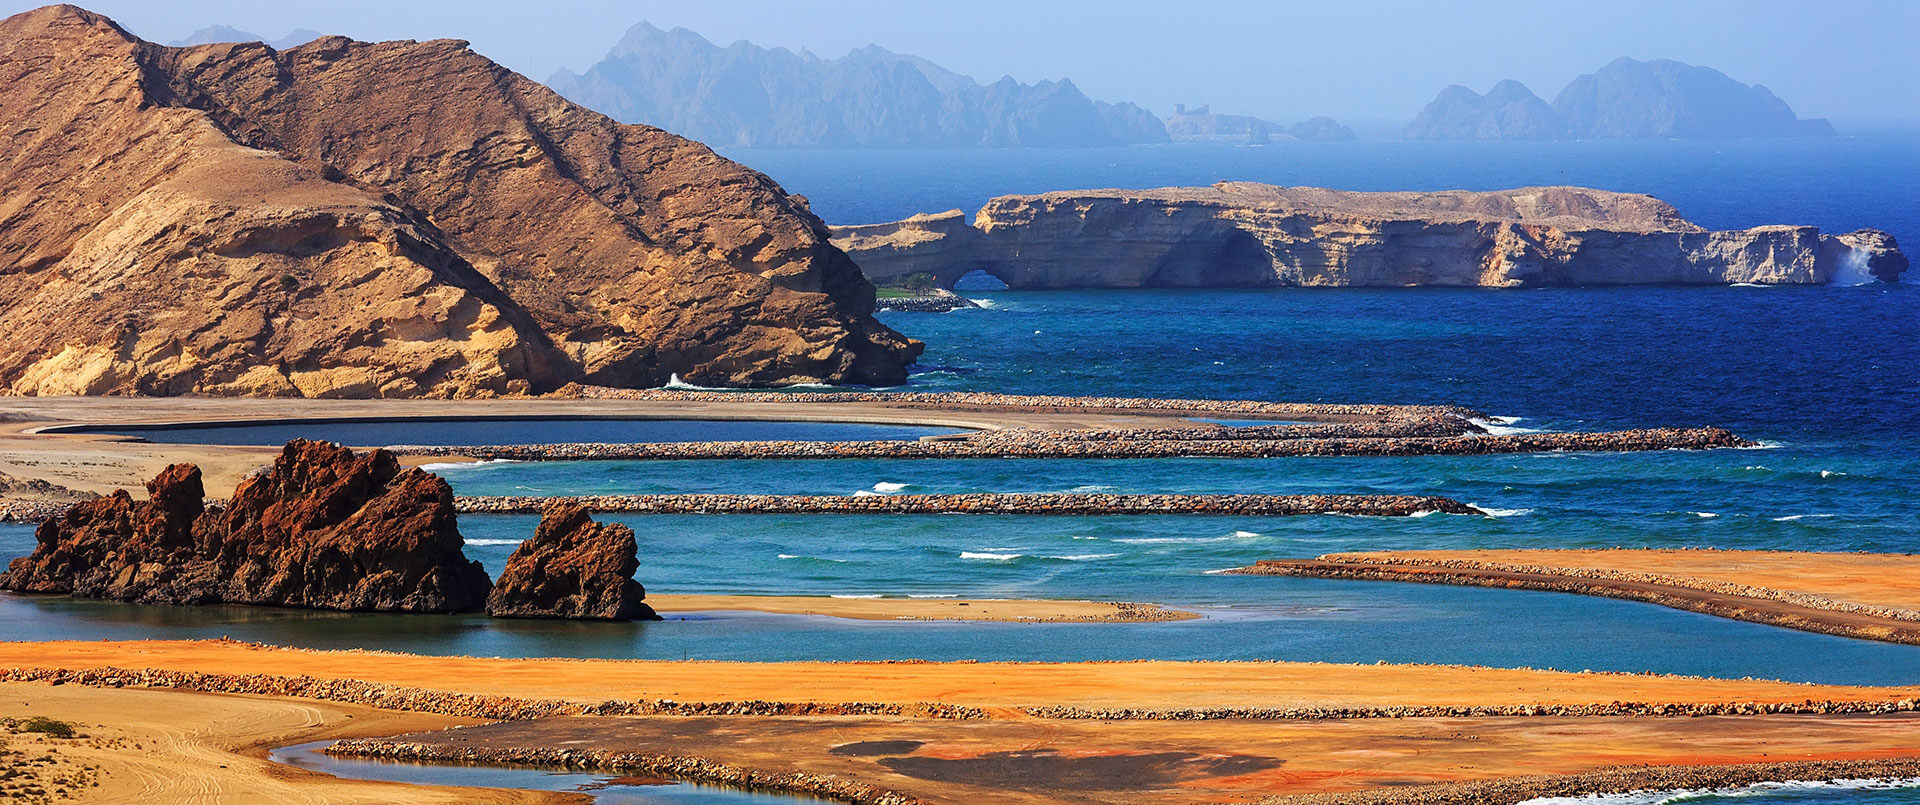 Classic Oman